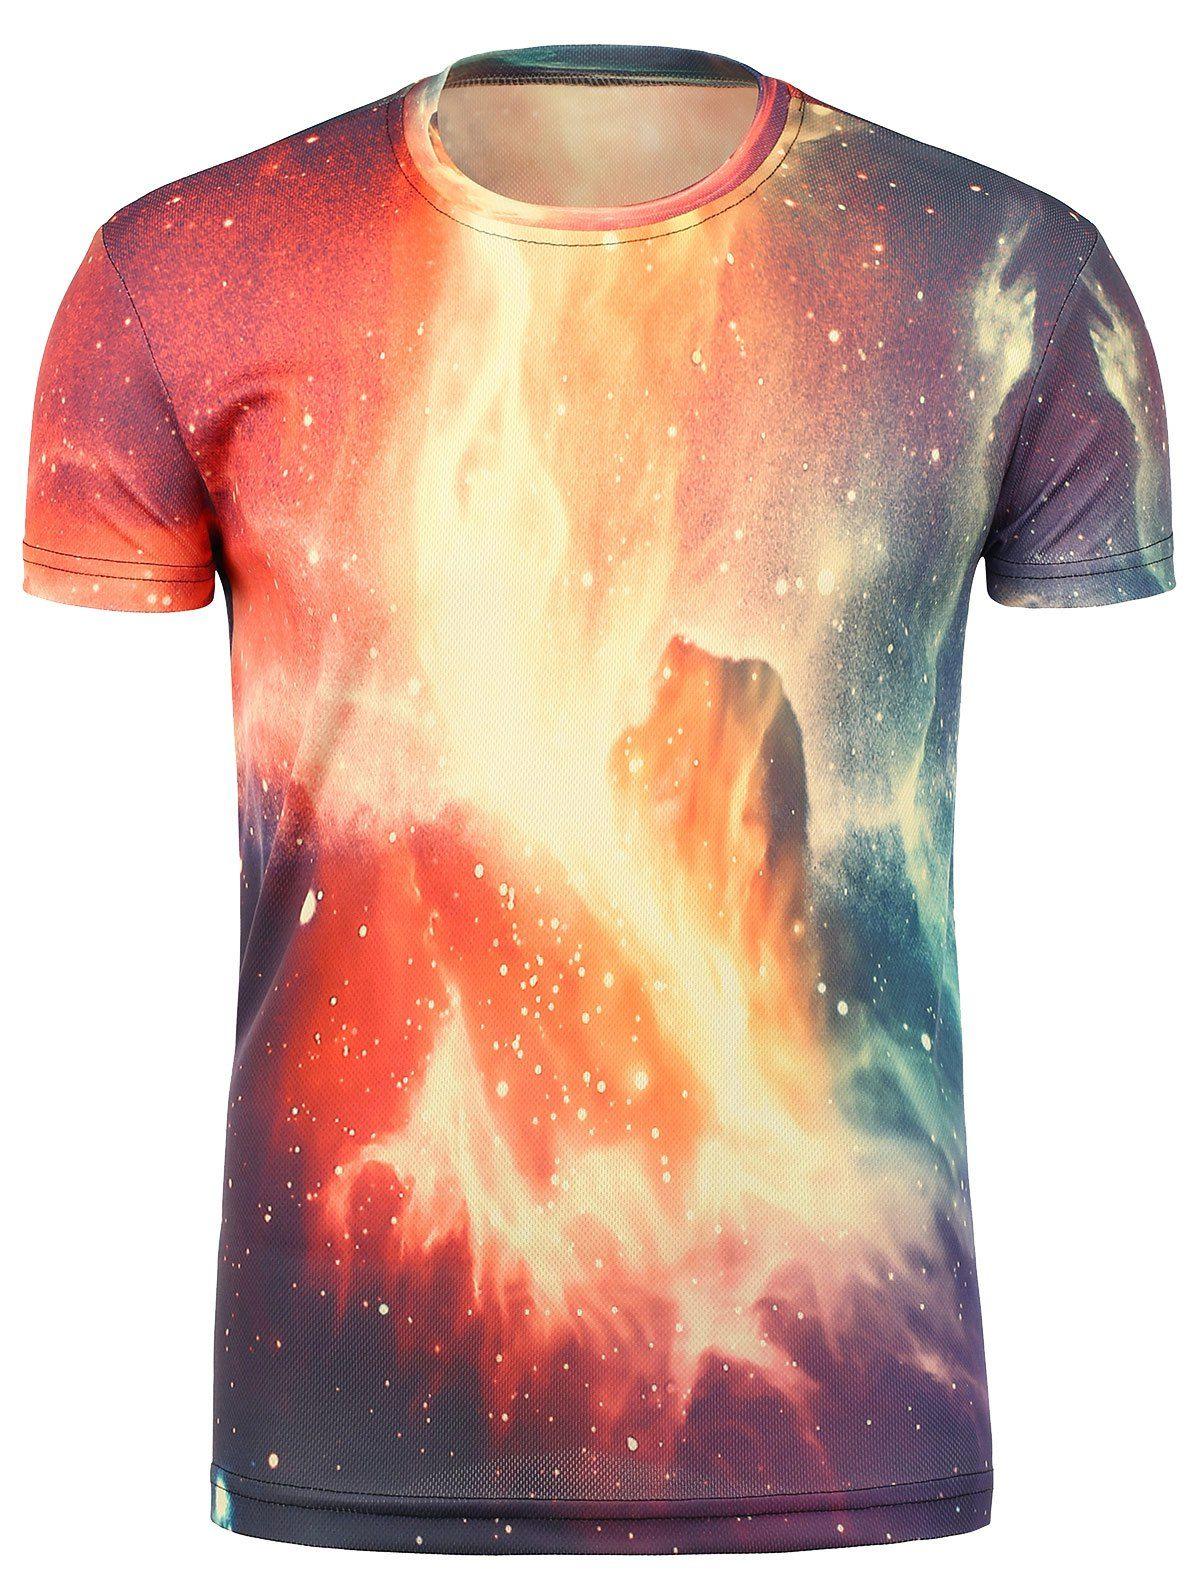 Tie Dye 3d Galaxy Print Trippy T Shirt Httpsammydress